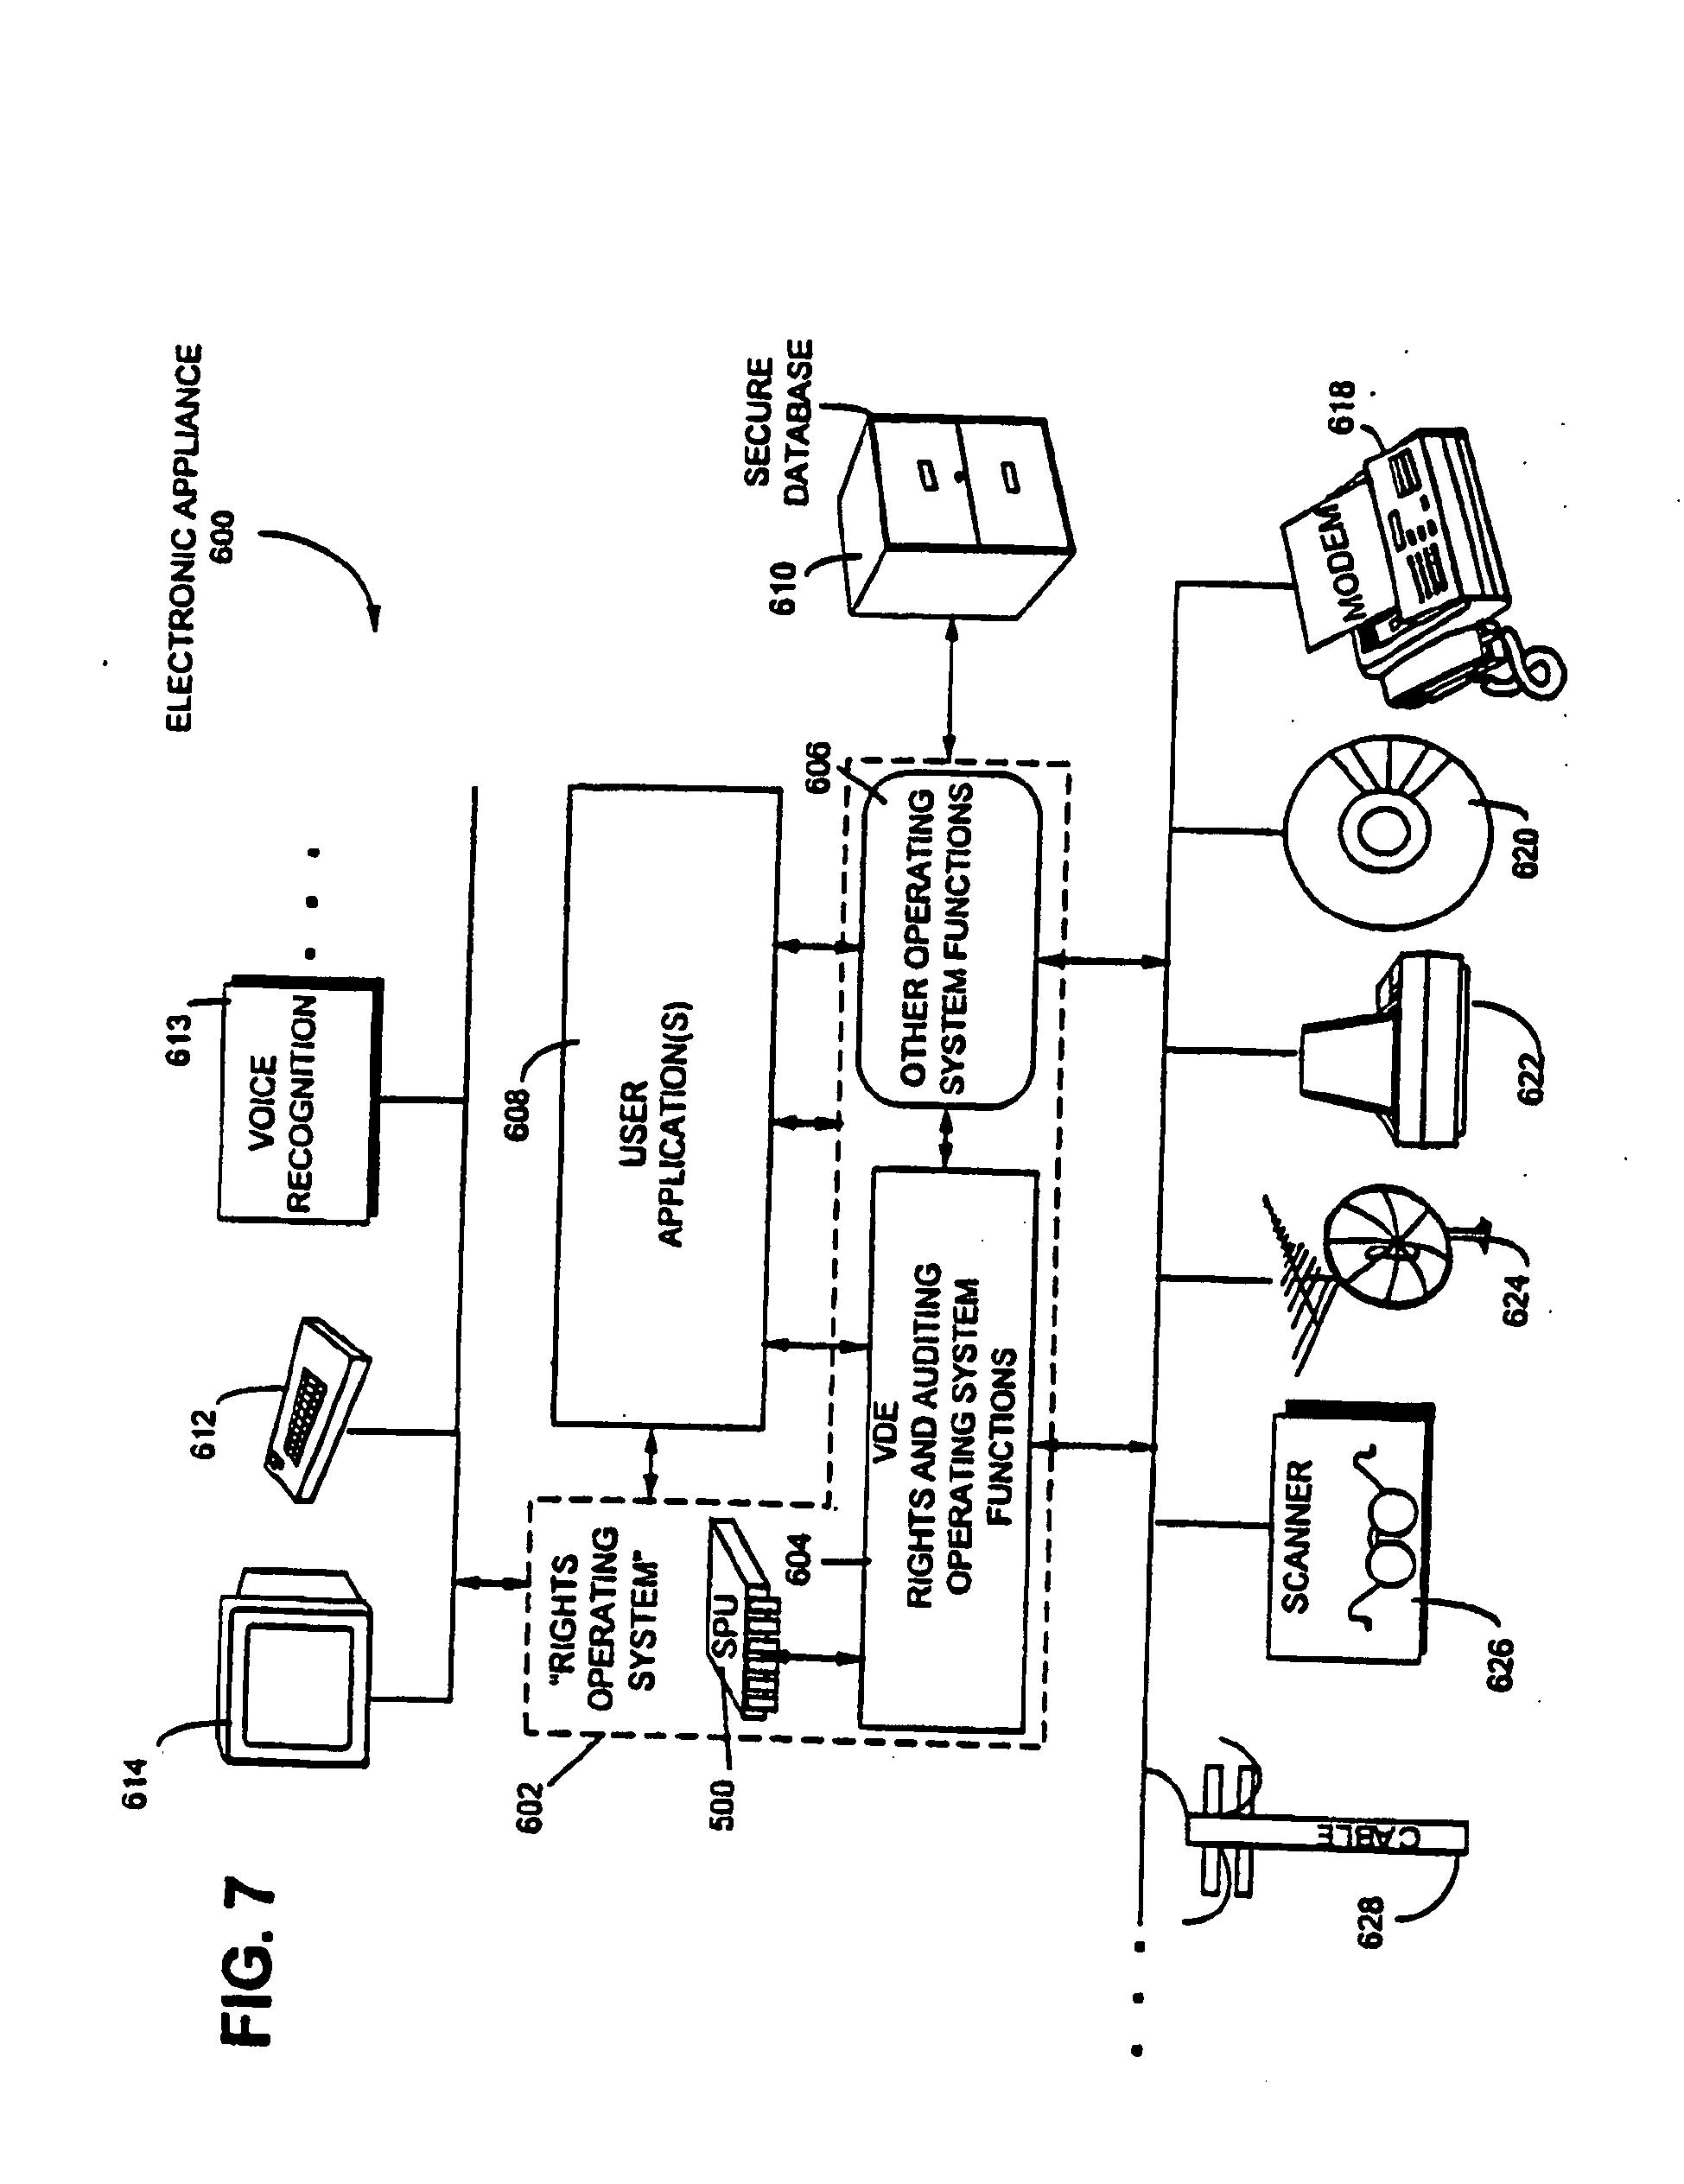 Ep1662418b1 Systmes Et Procds De Gestion Transactions Pic Programmable Integrated Circuits Wouter Van Ooijen Scurises Protection Des Droits Lectroniques Google Patents